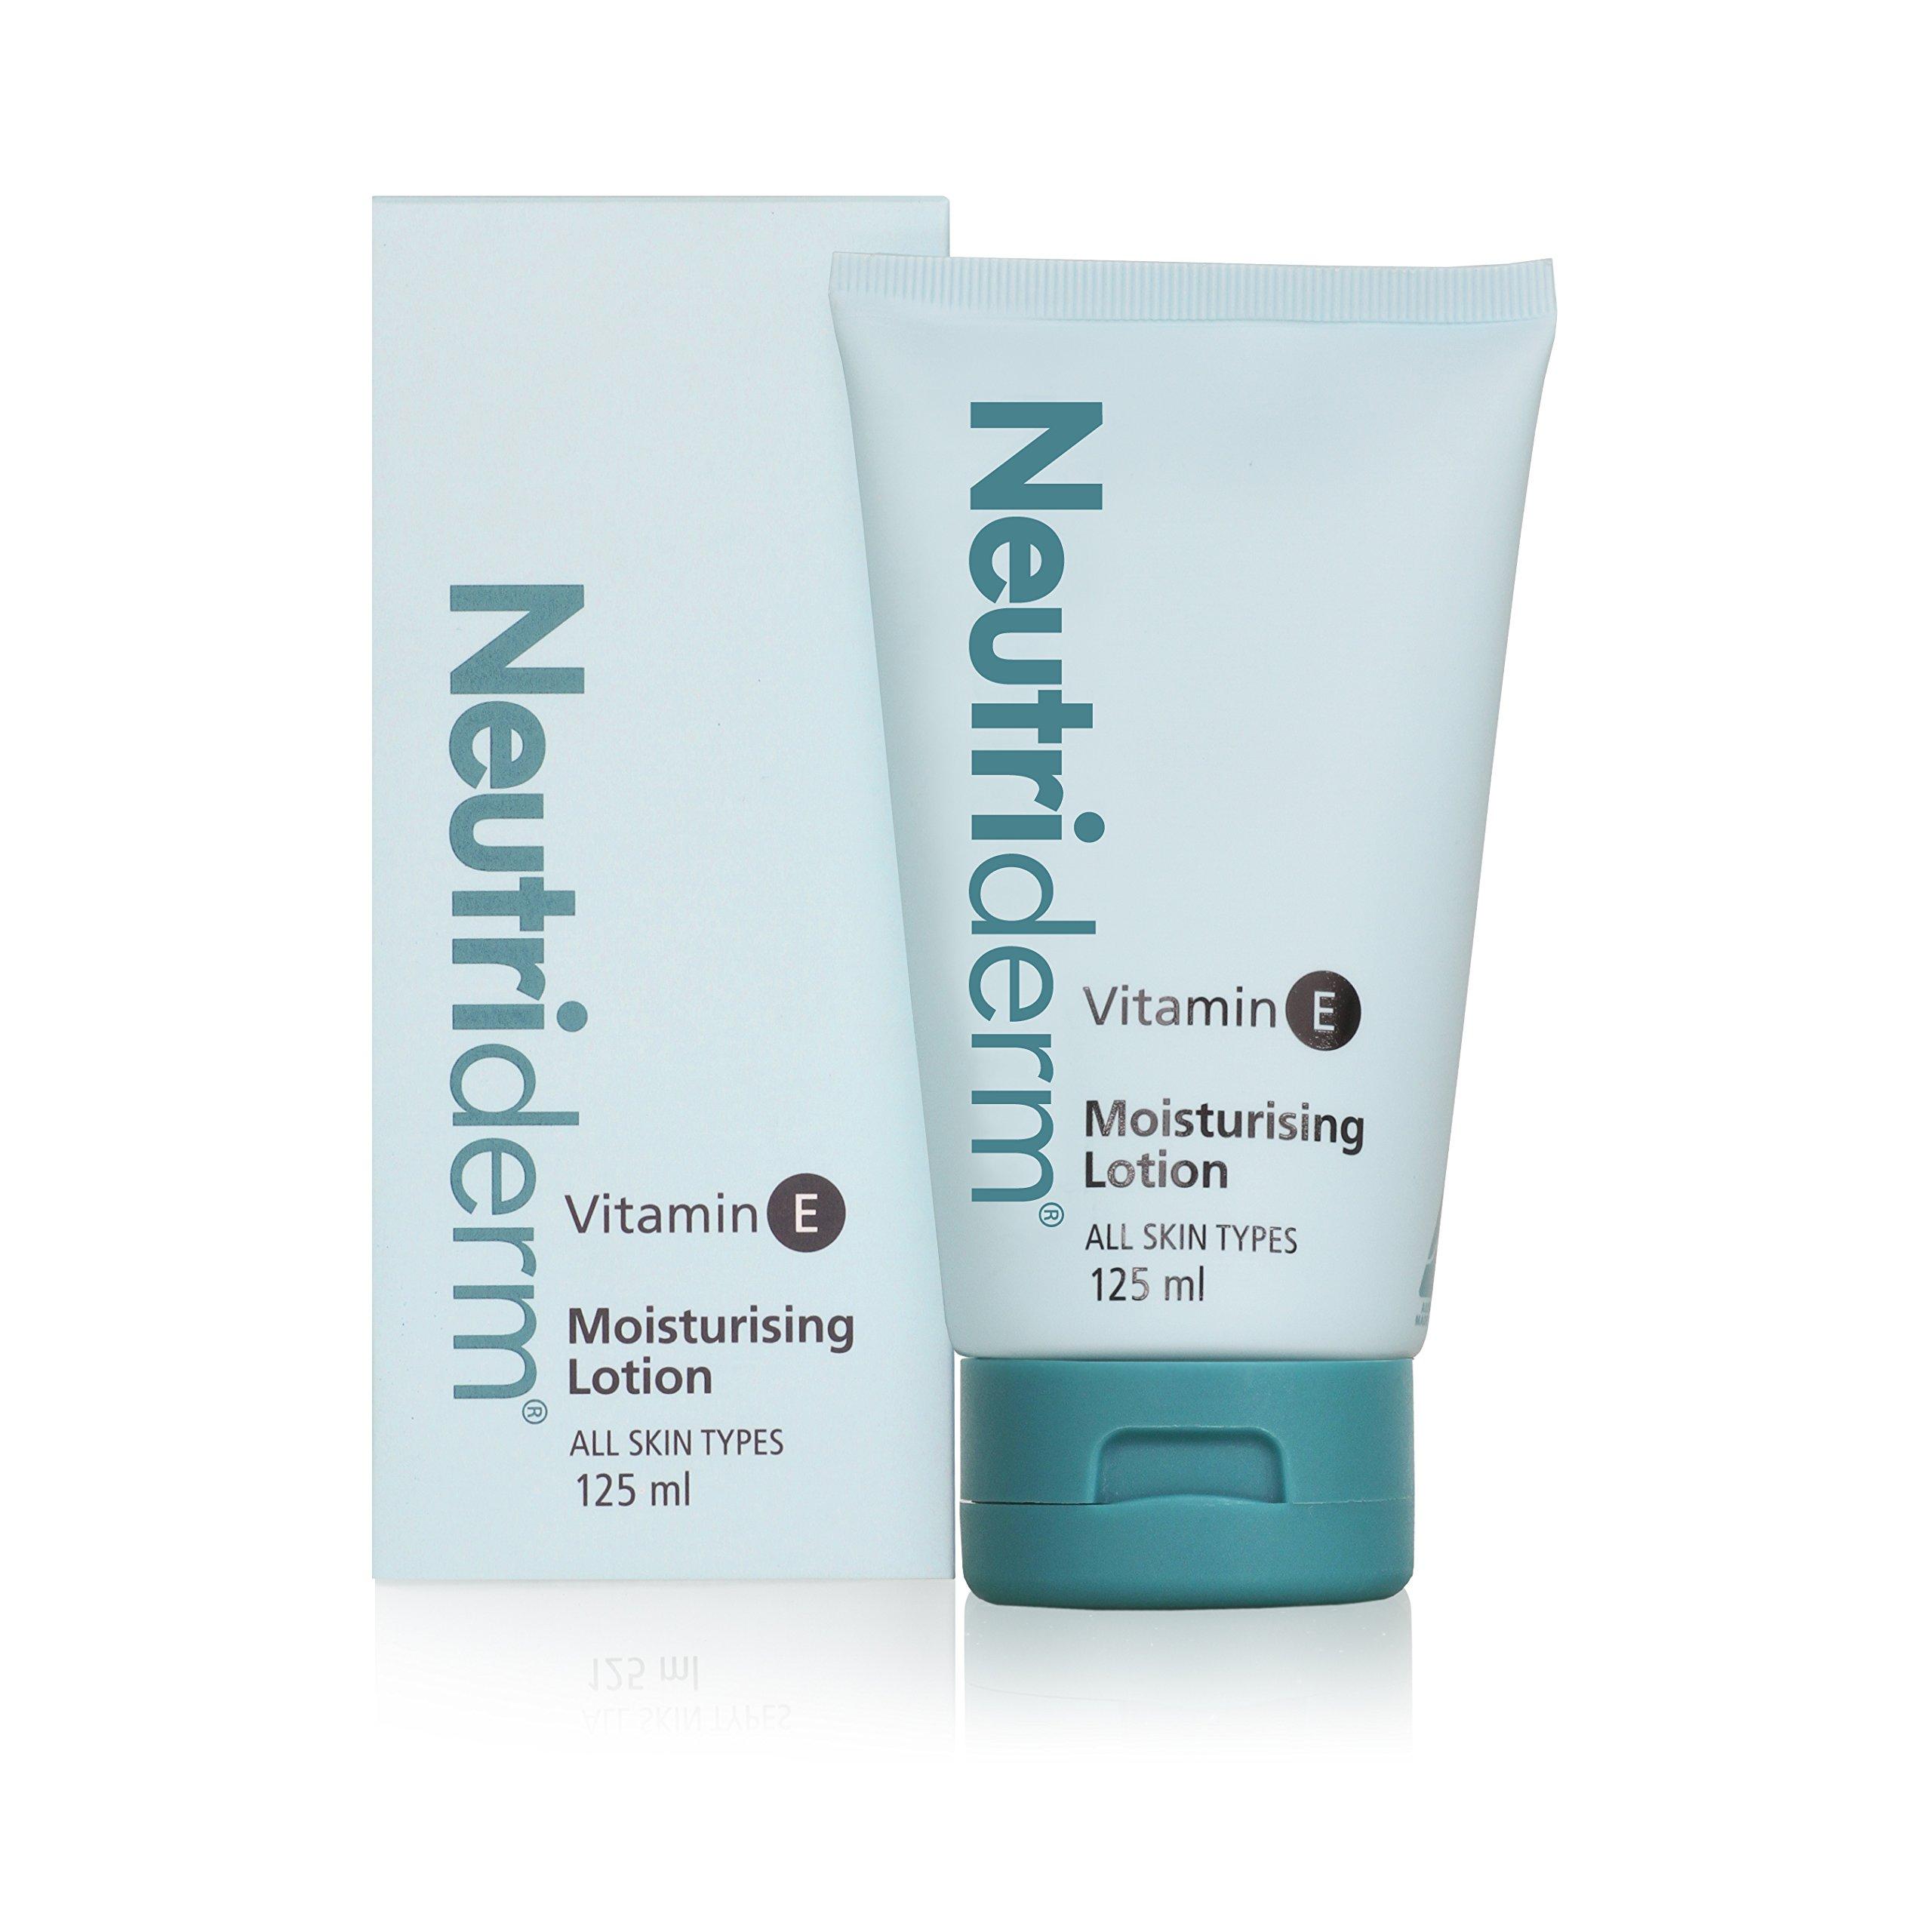 Neutriderm Vitamin E Moisturising Lotion (125 ml) product image